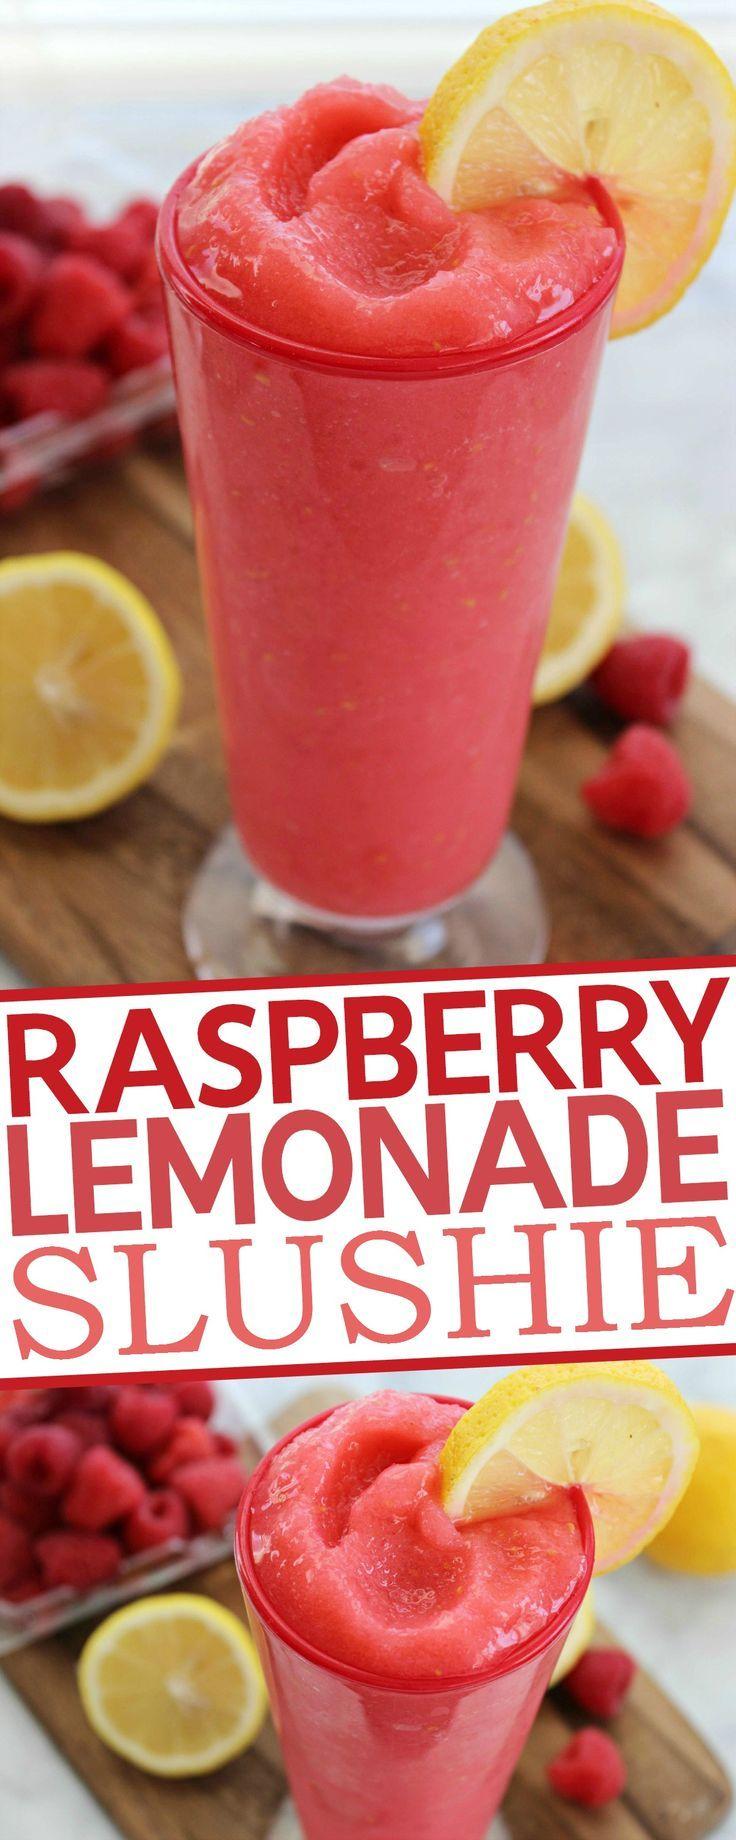 Raspberry Lemonade Slushie Recipe {wineglasswriter.com/}